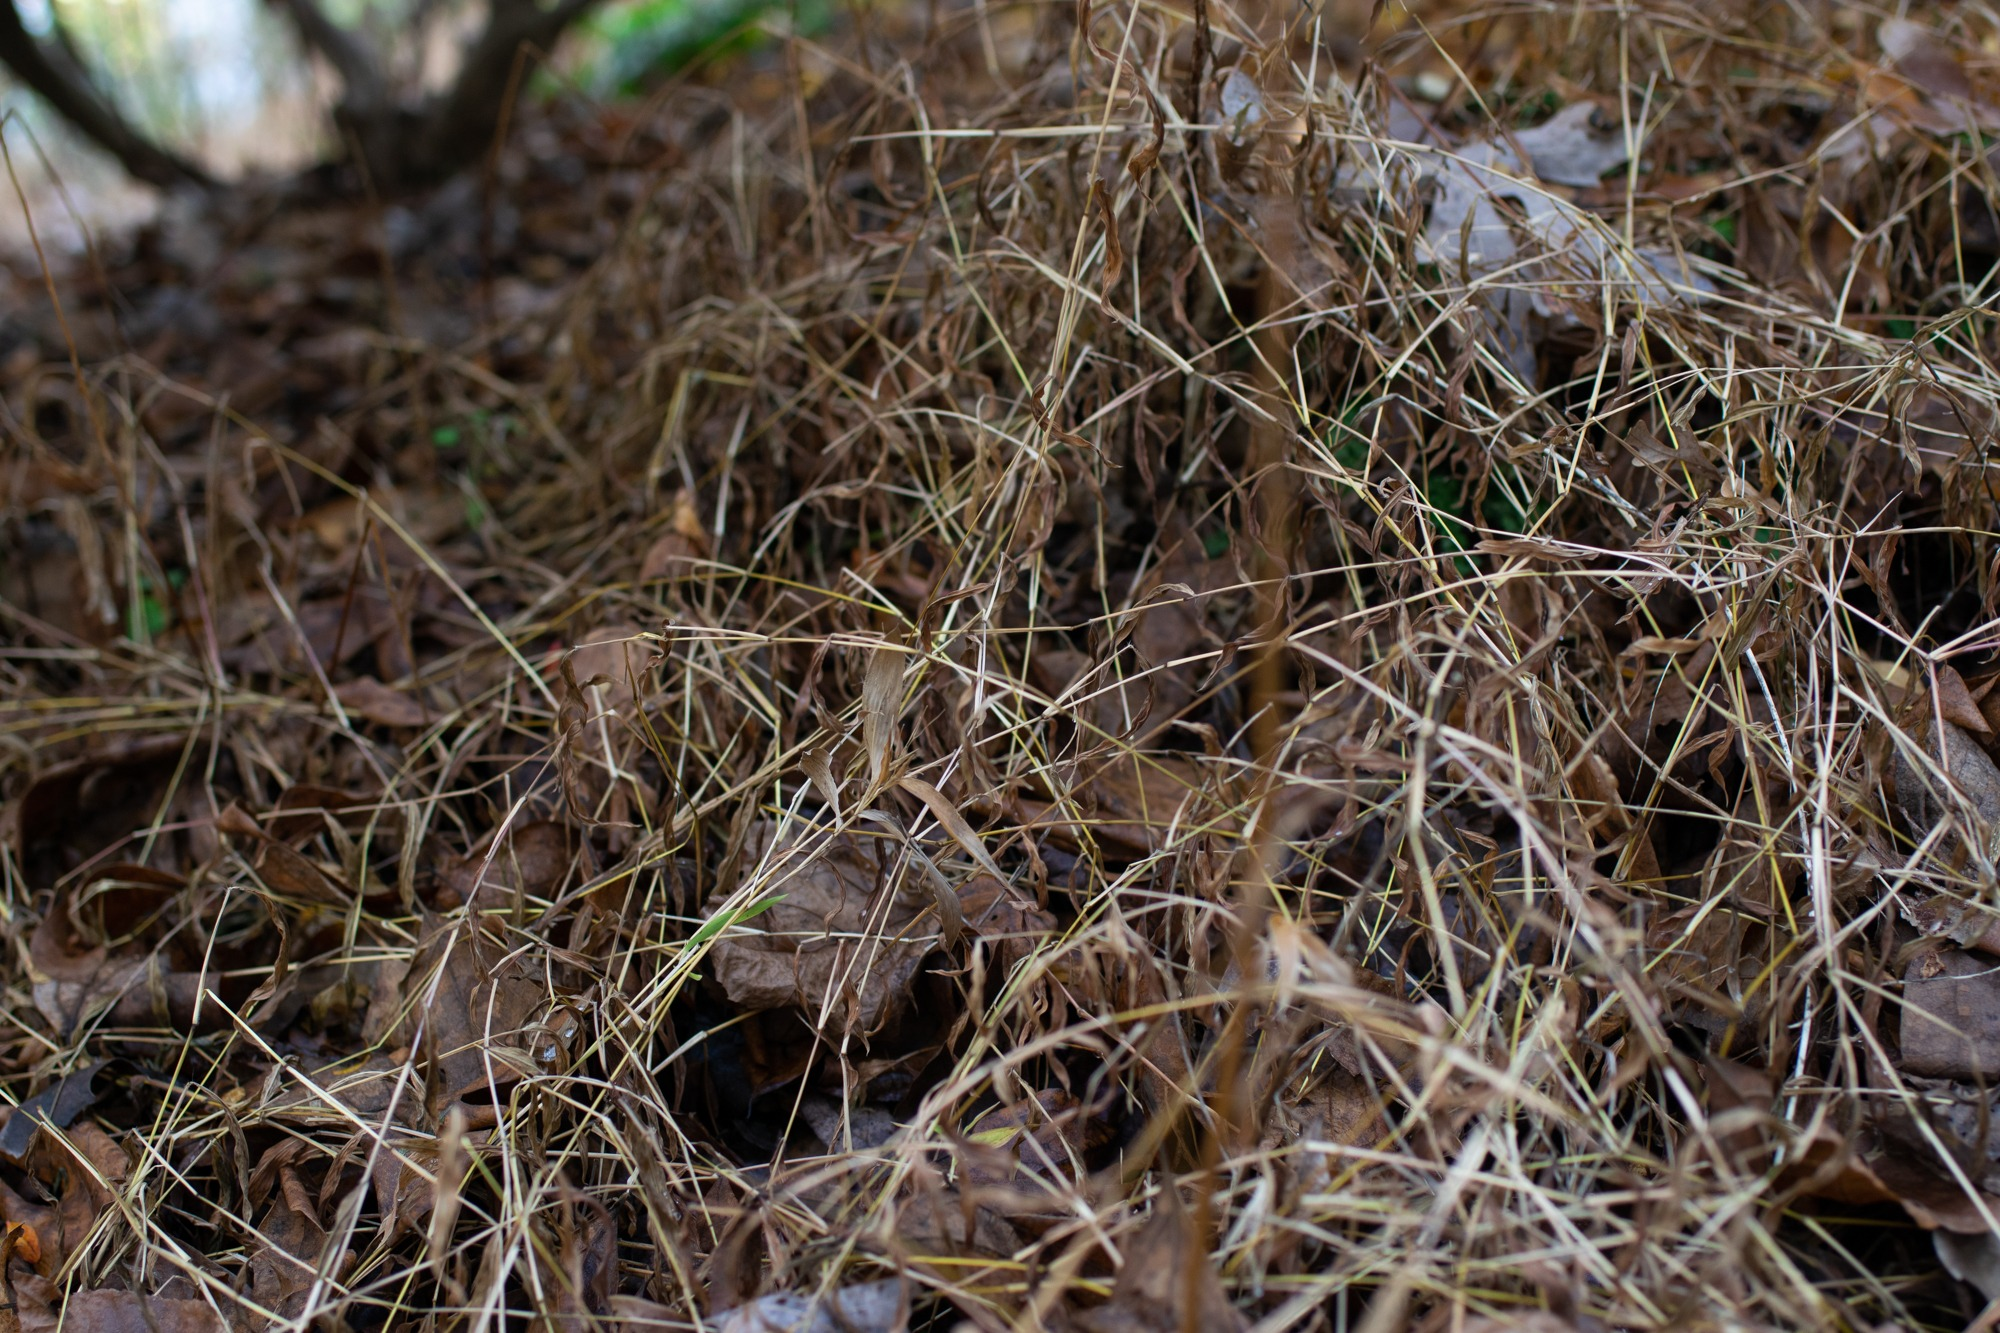 Patch of dead Japanese stiltgrass